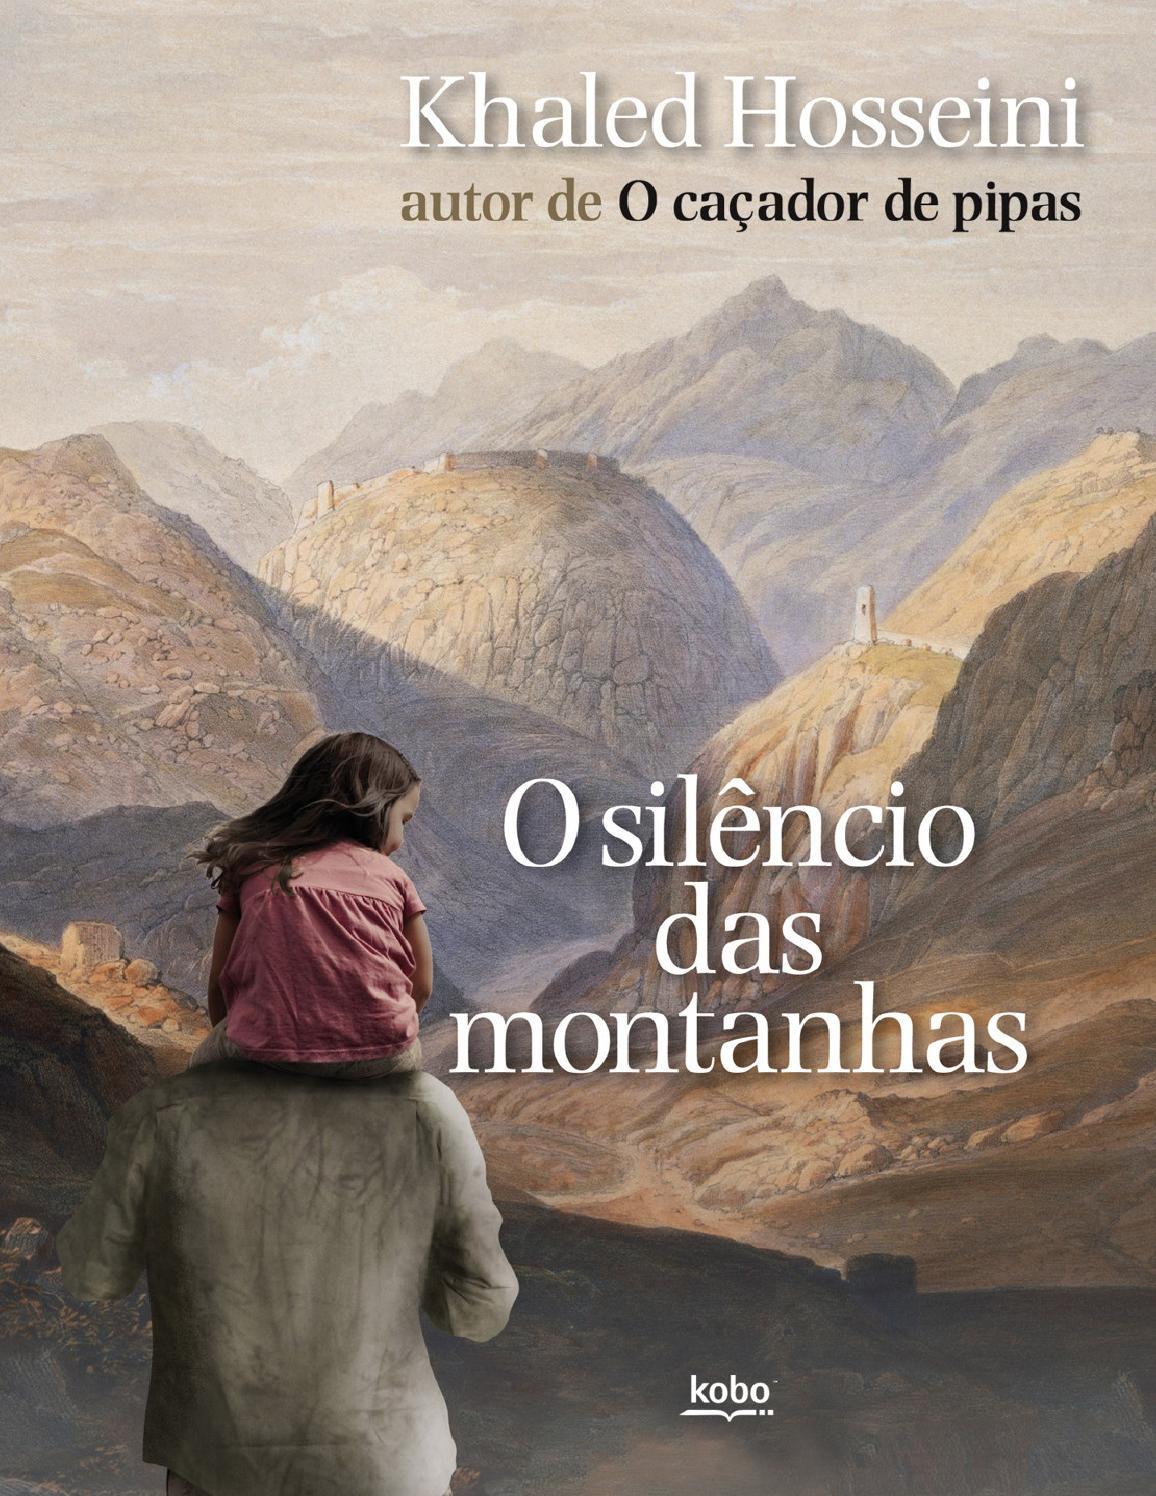 O silencio das montanhas khaled hosseini by Taynara Wanderley - issuu 3c32706e1f9